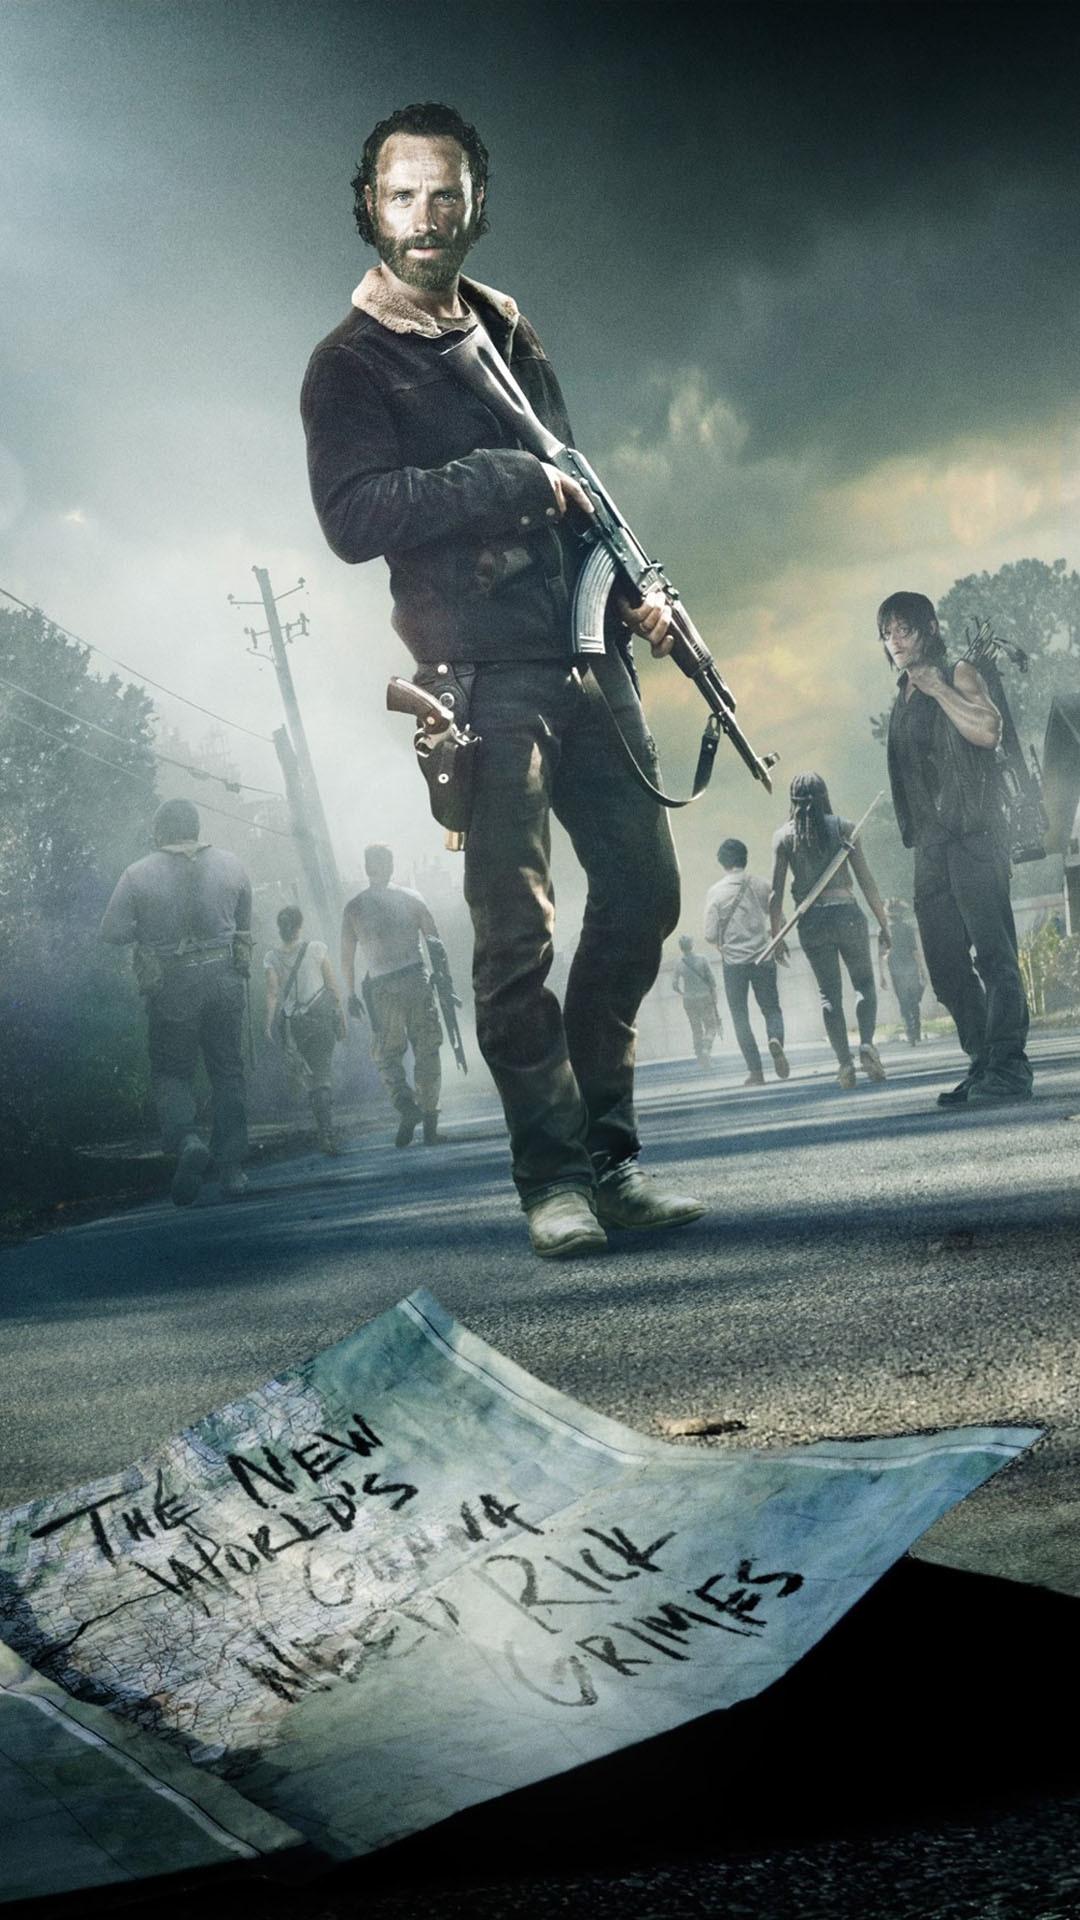 The Walking Dead iPhone Wallpaper – WallpaperSafari